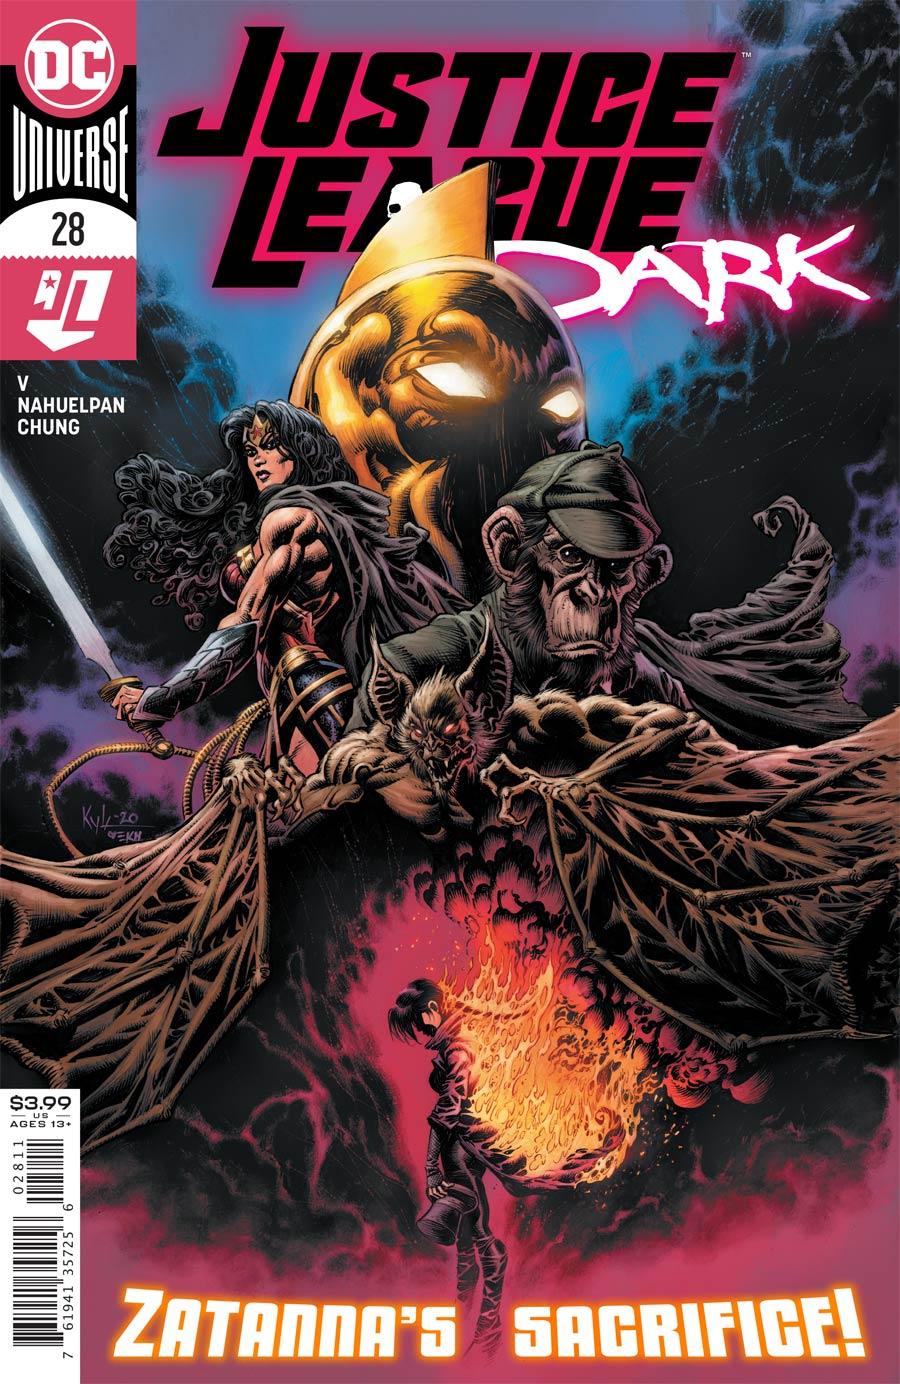 Justice League Dark #28